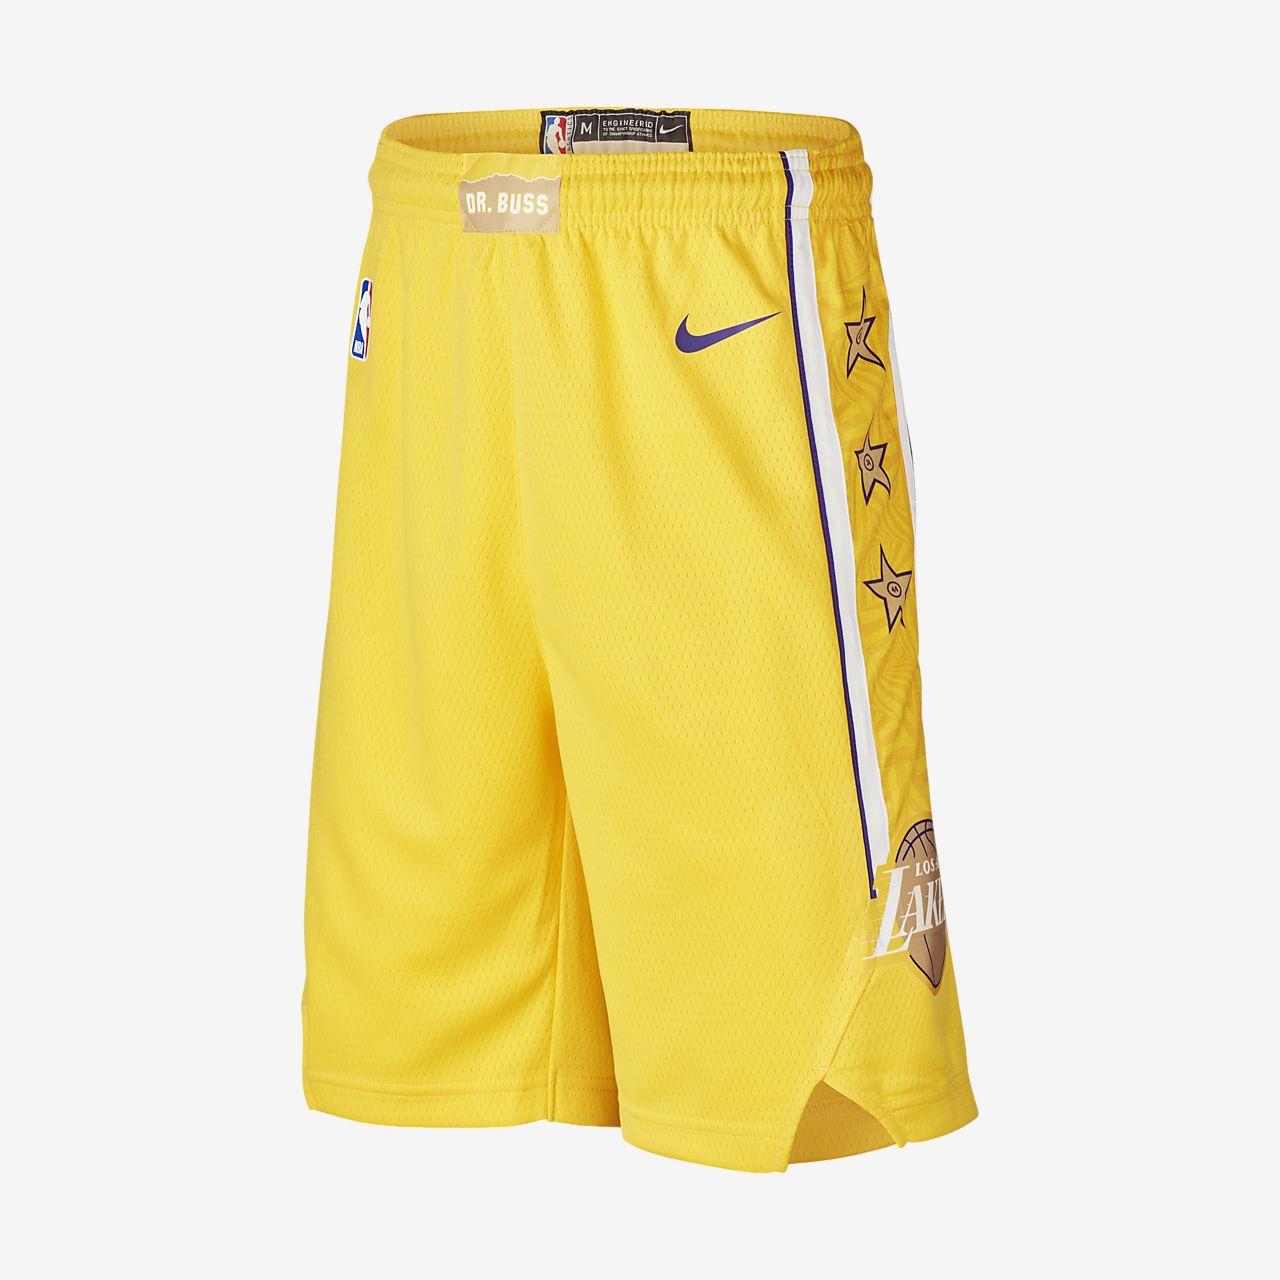 Shorts Lakers City Edition Swingman Nike NBA Ragazzi